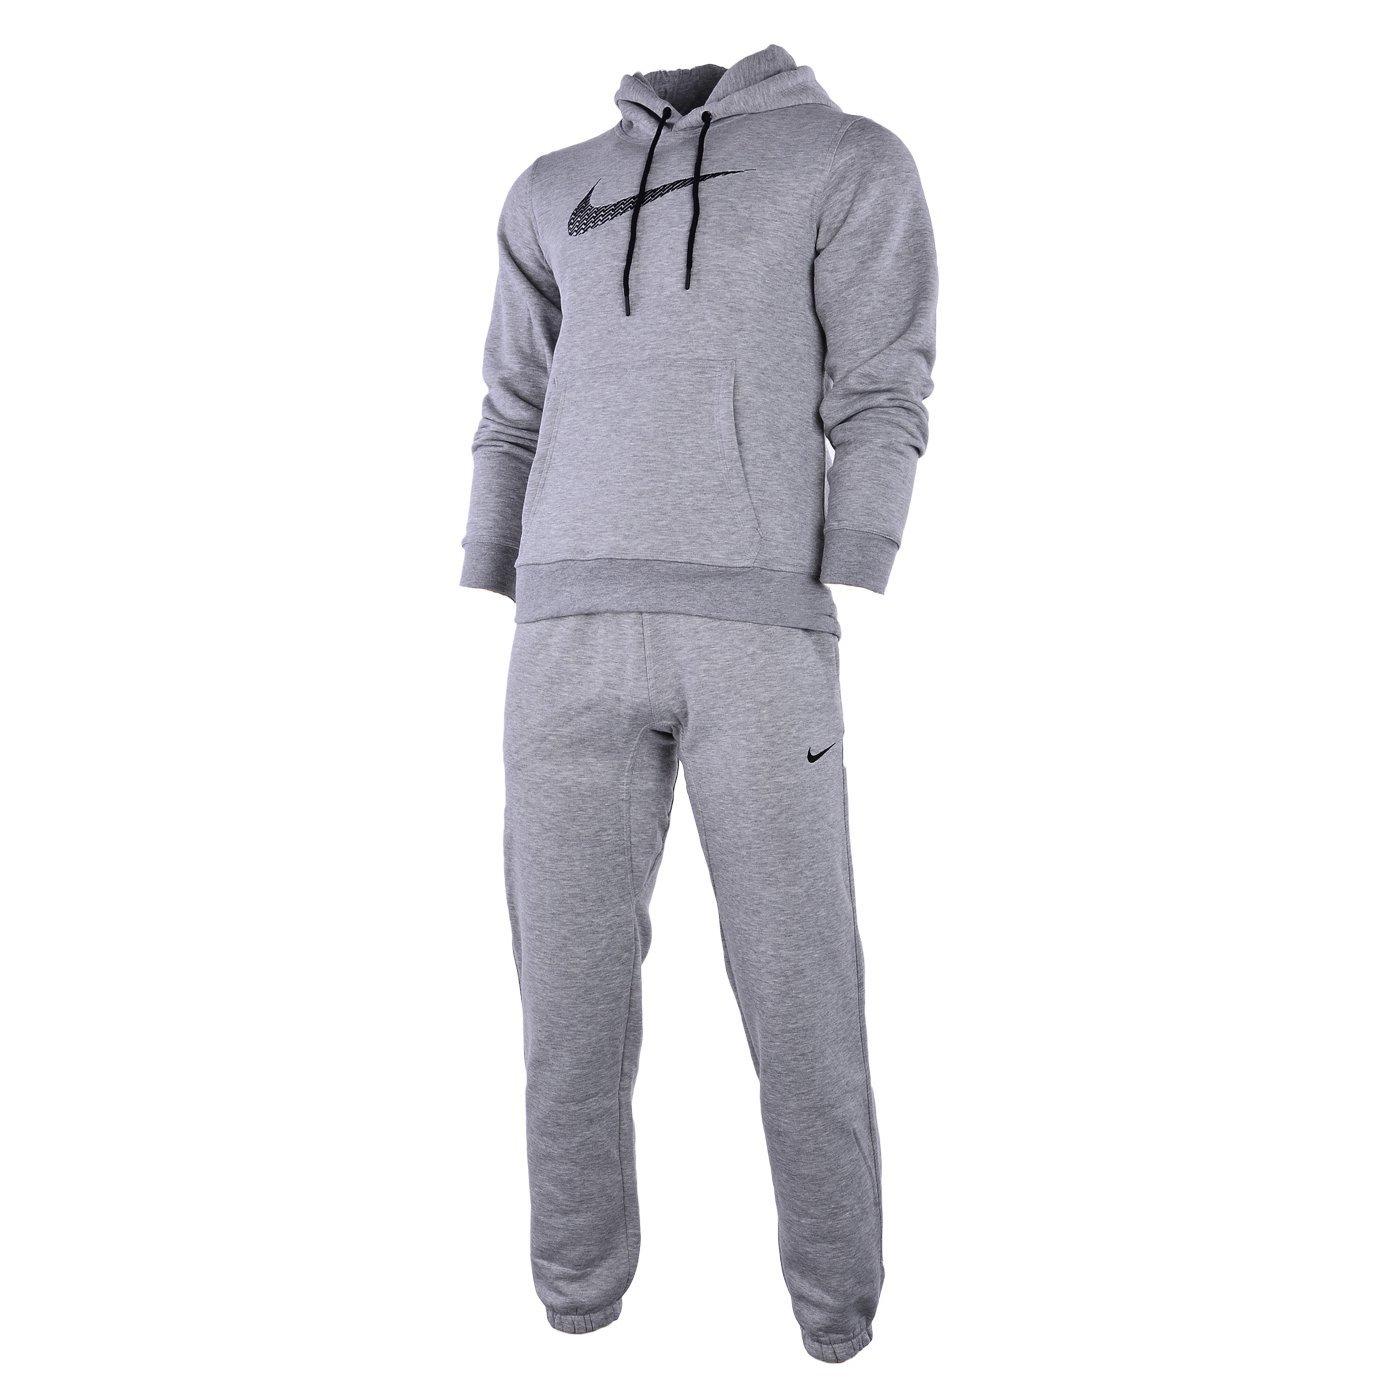 Nike Negro De Hombre 679387 Chándal Completo - Gris, Large: Amazon ...